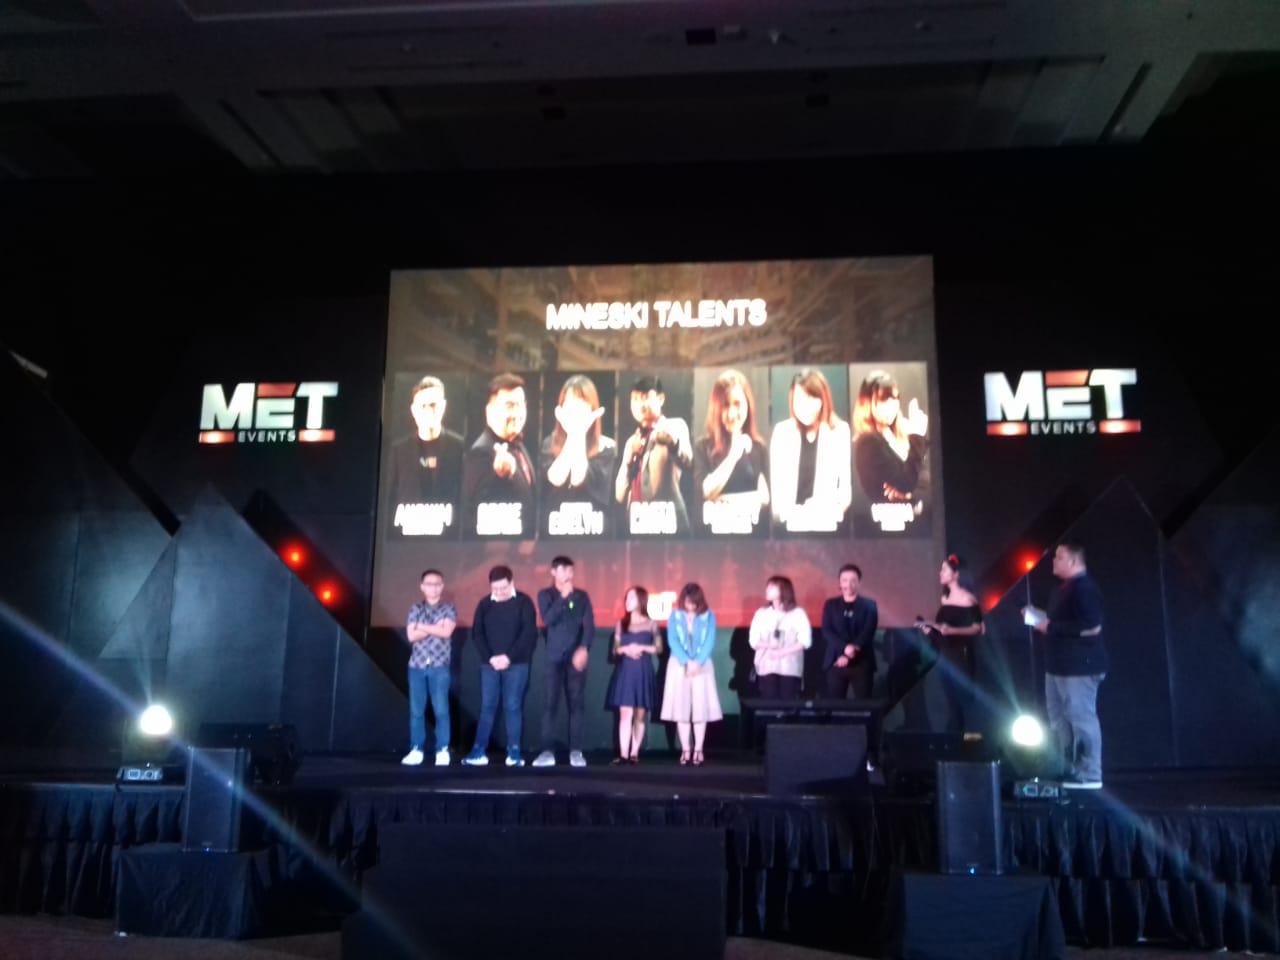 Mineski talent Indonesia